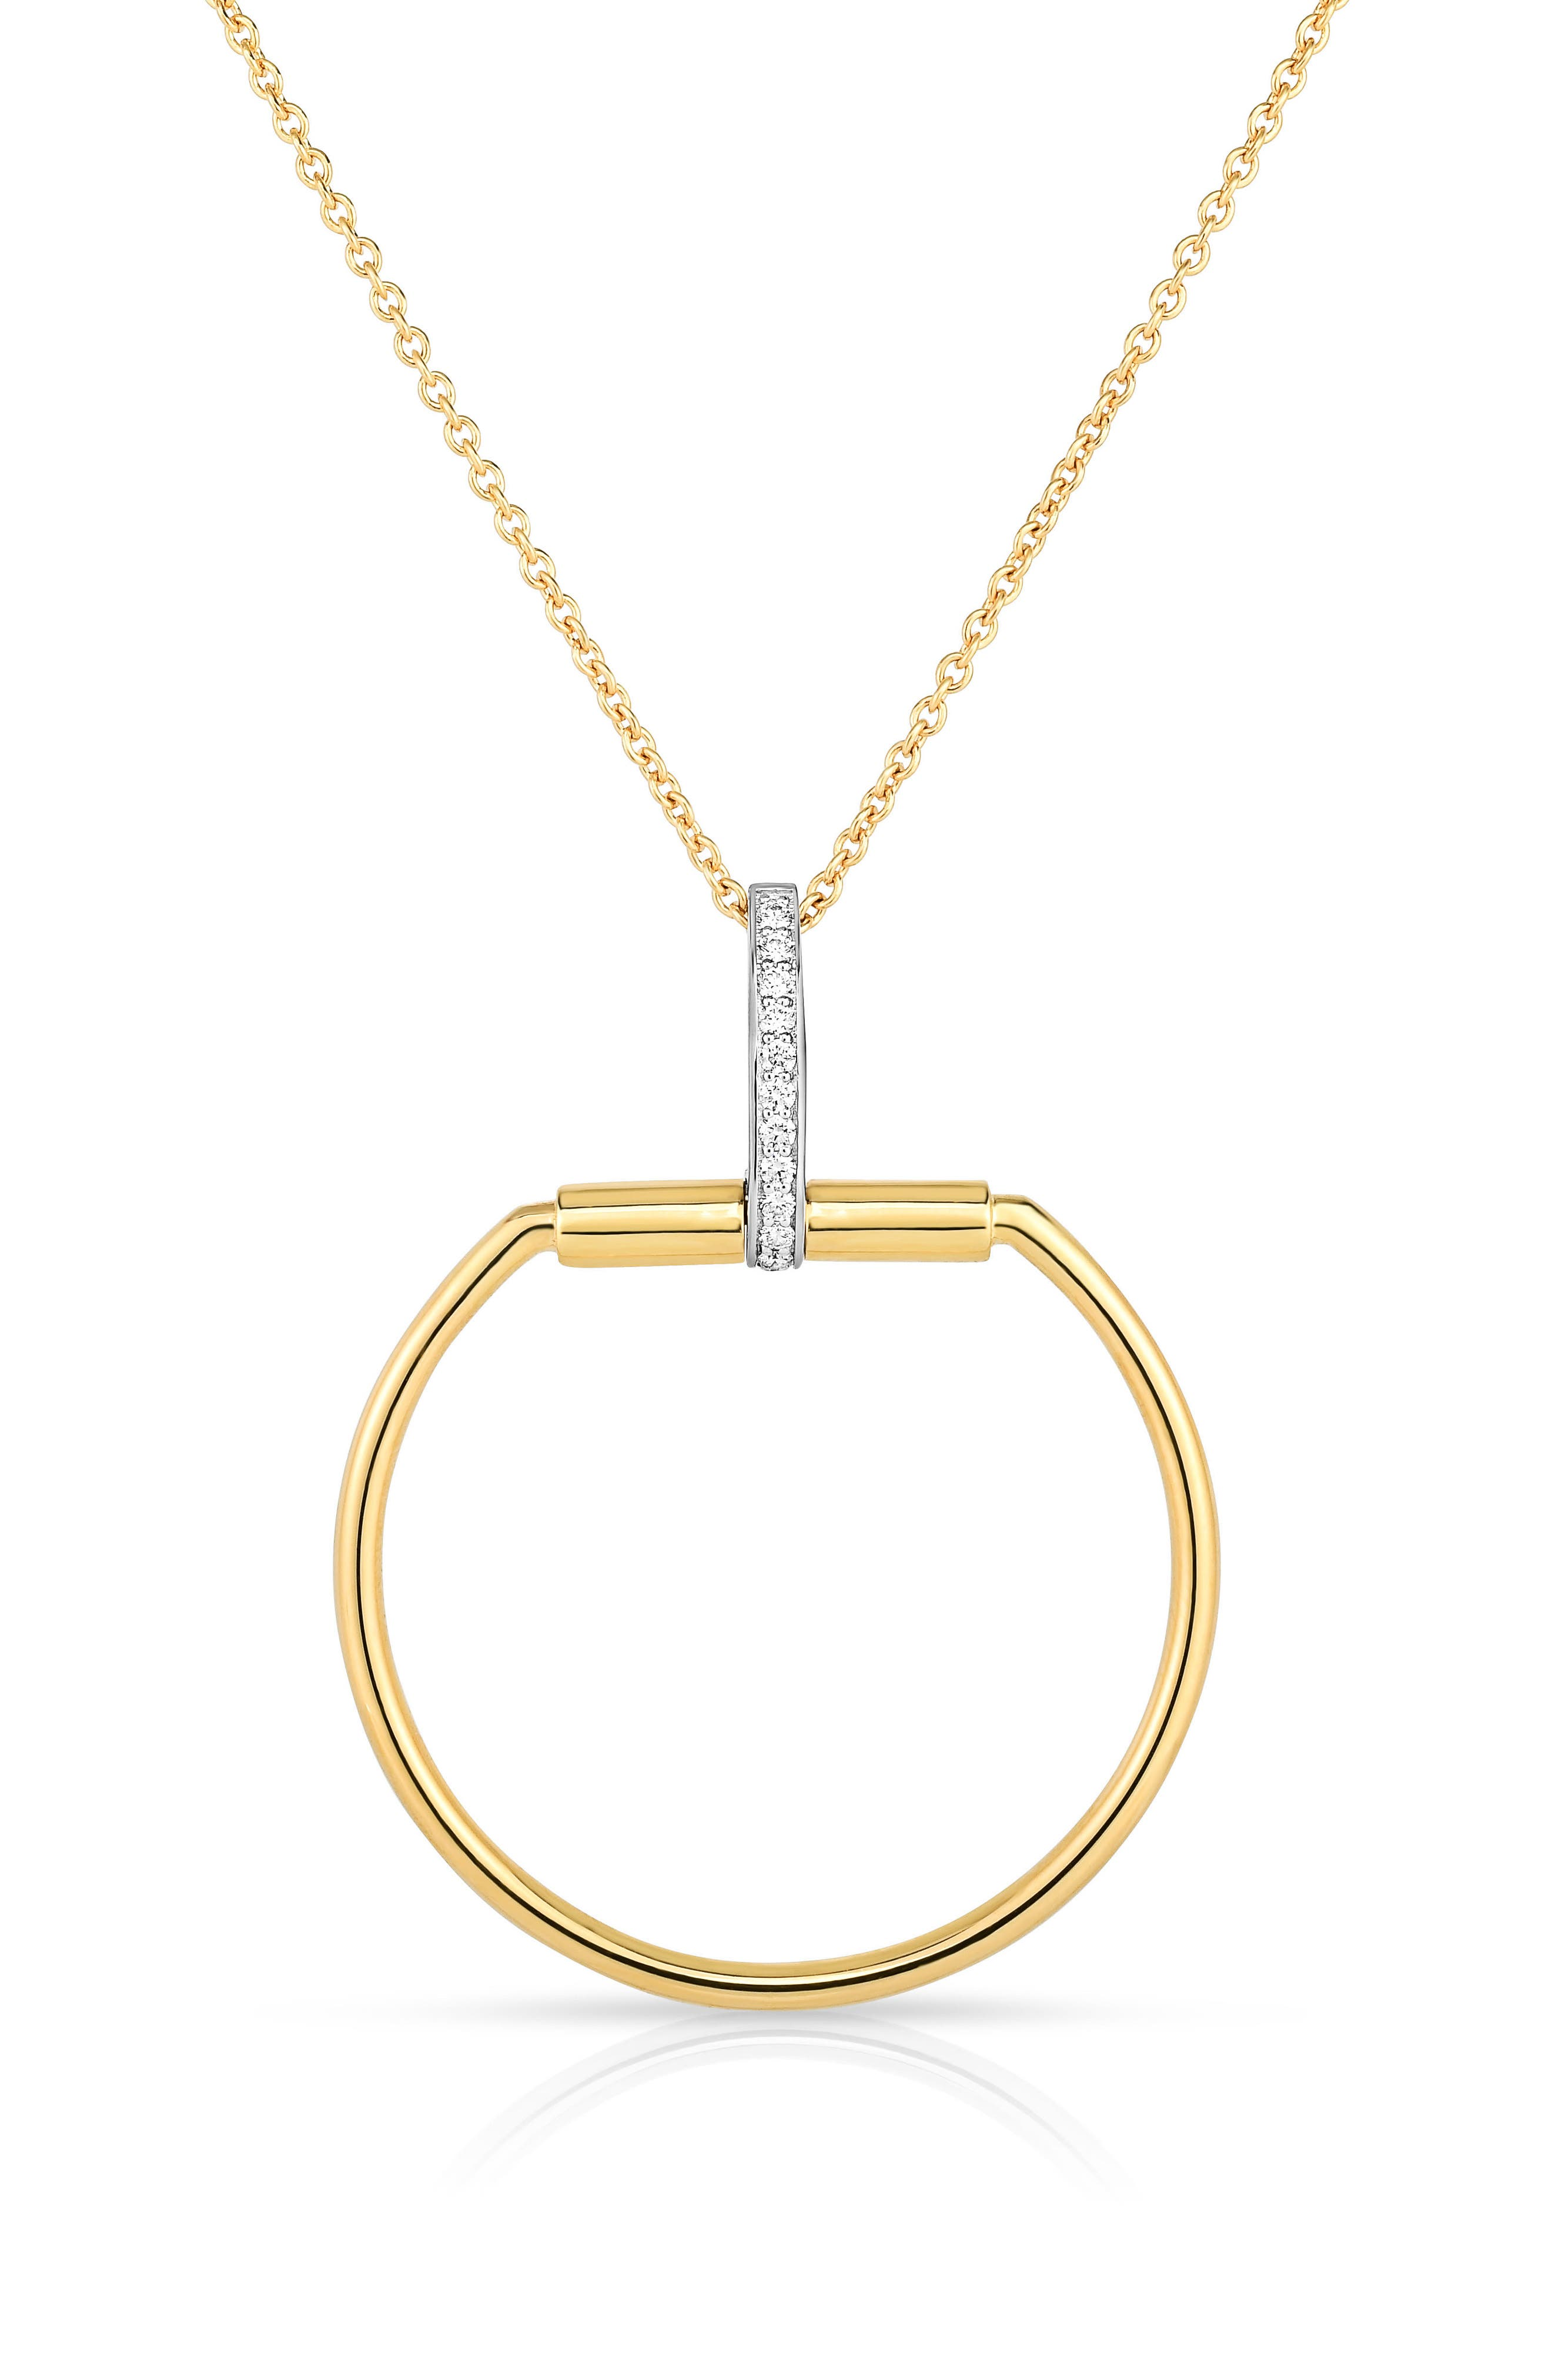 Classica Parisienne Diamond Pendant Necklace,                             Main thumbnail 1, color,                             Yellow Gold